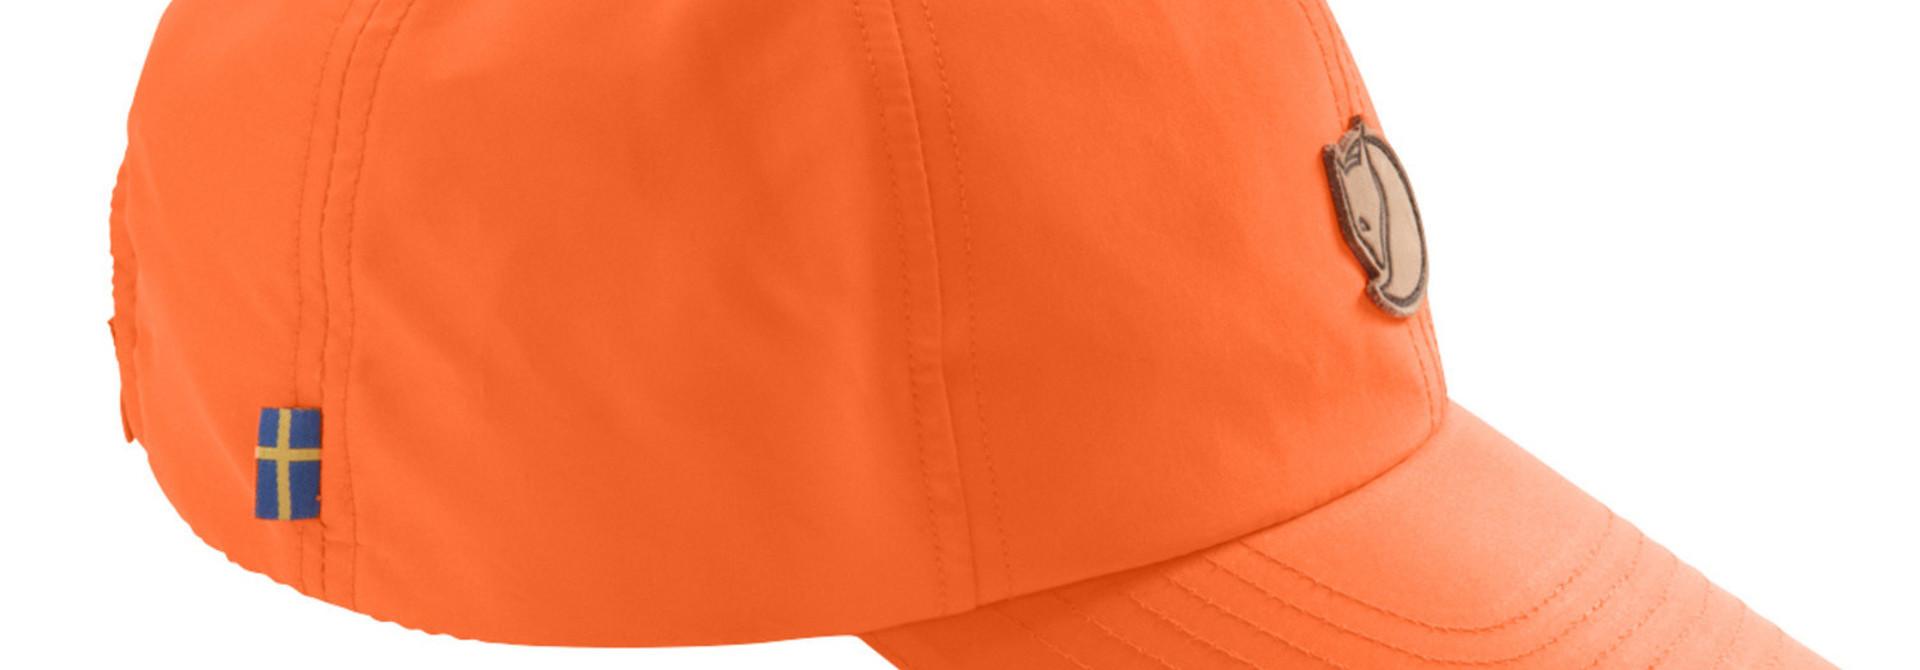 Fjällräven Safety Cap Safety Orange